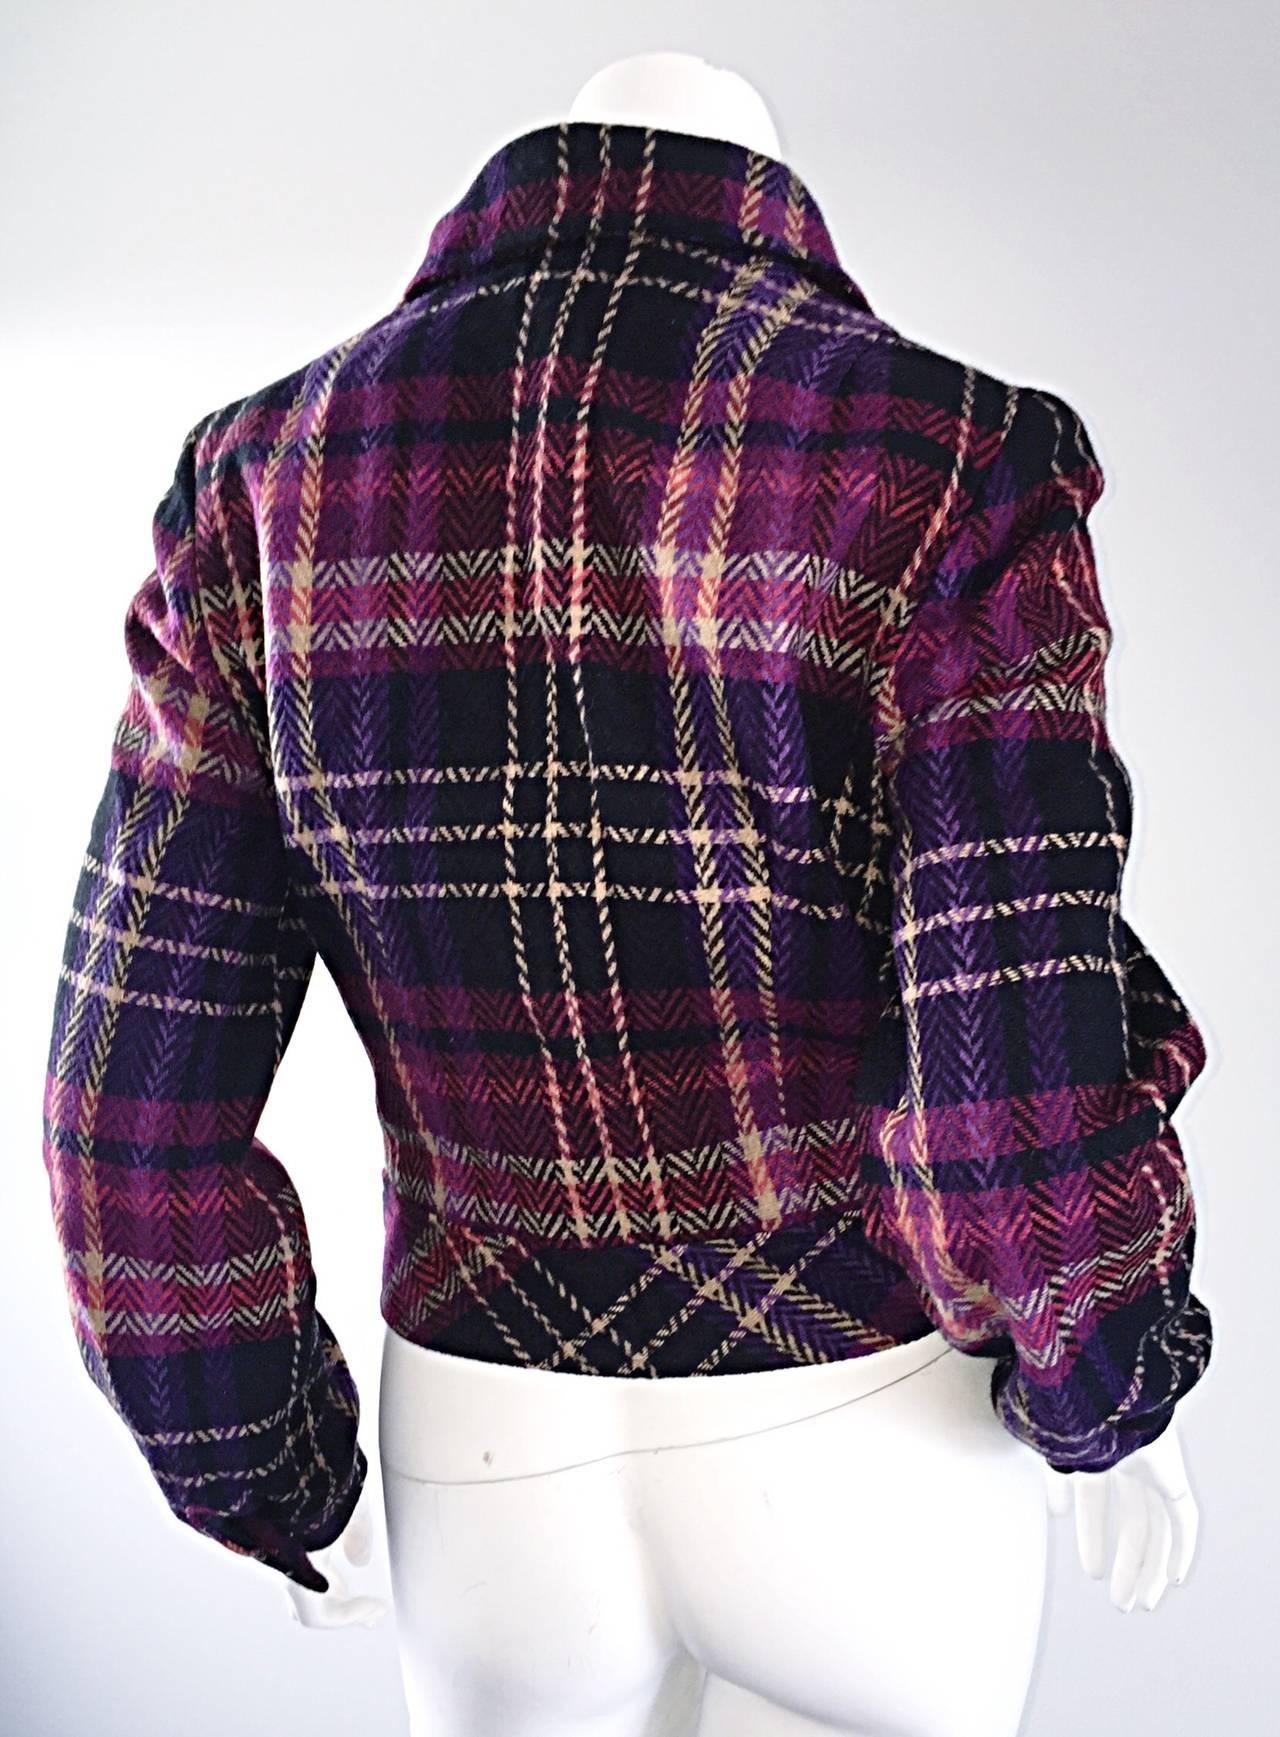 1970s Vintage Addena for I. Magnin Pink + Purple Plaid Herringbone Wool Jacket 6